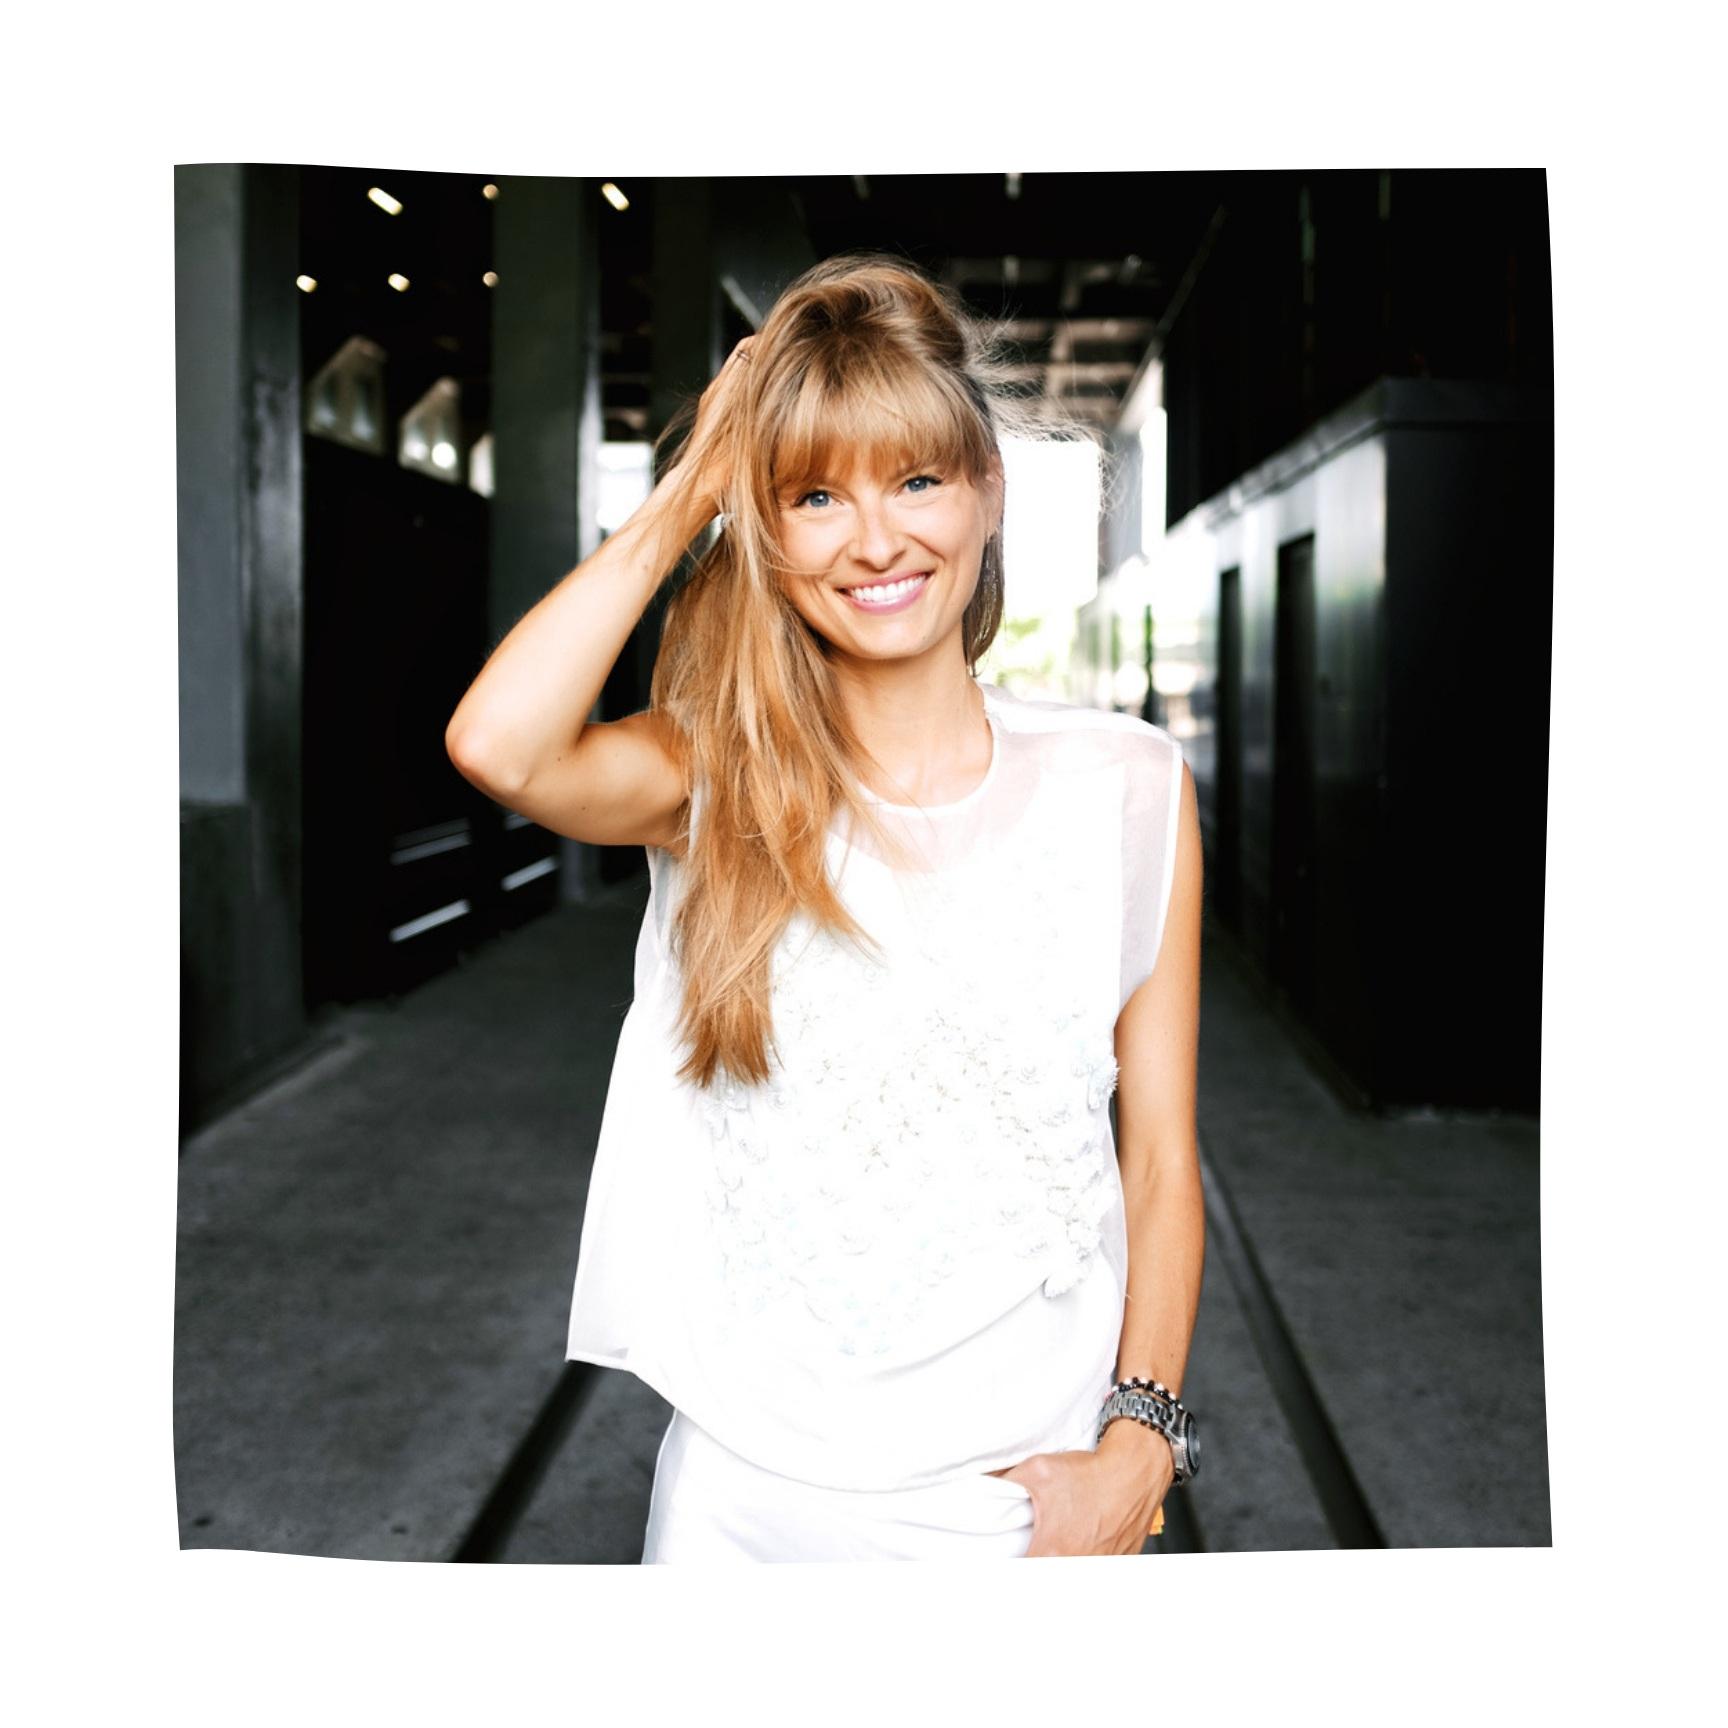 Natalie Decleve - BLOGGER, JOURNALIST